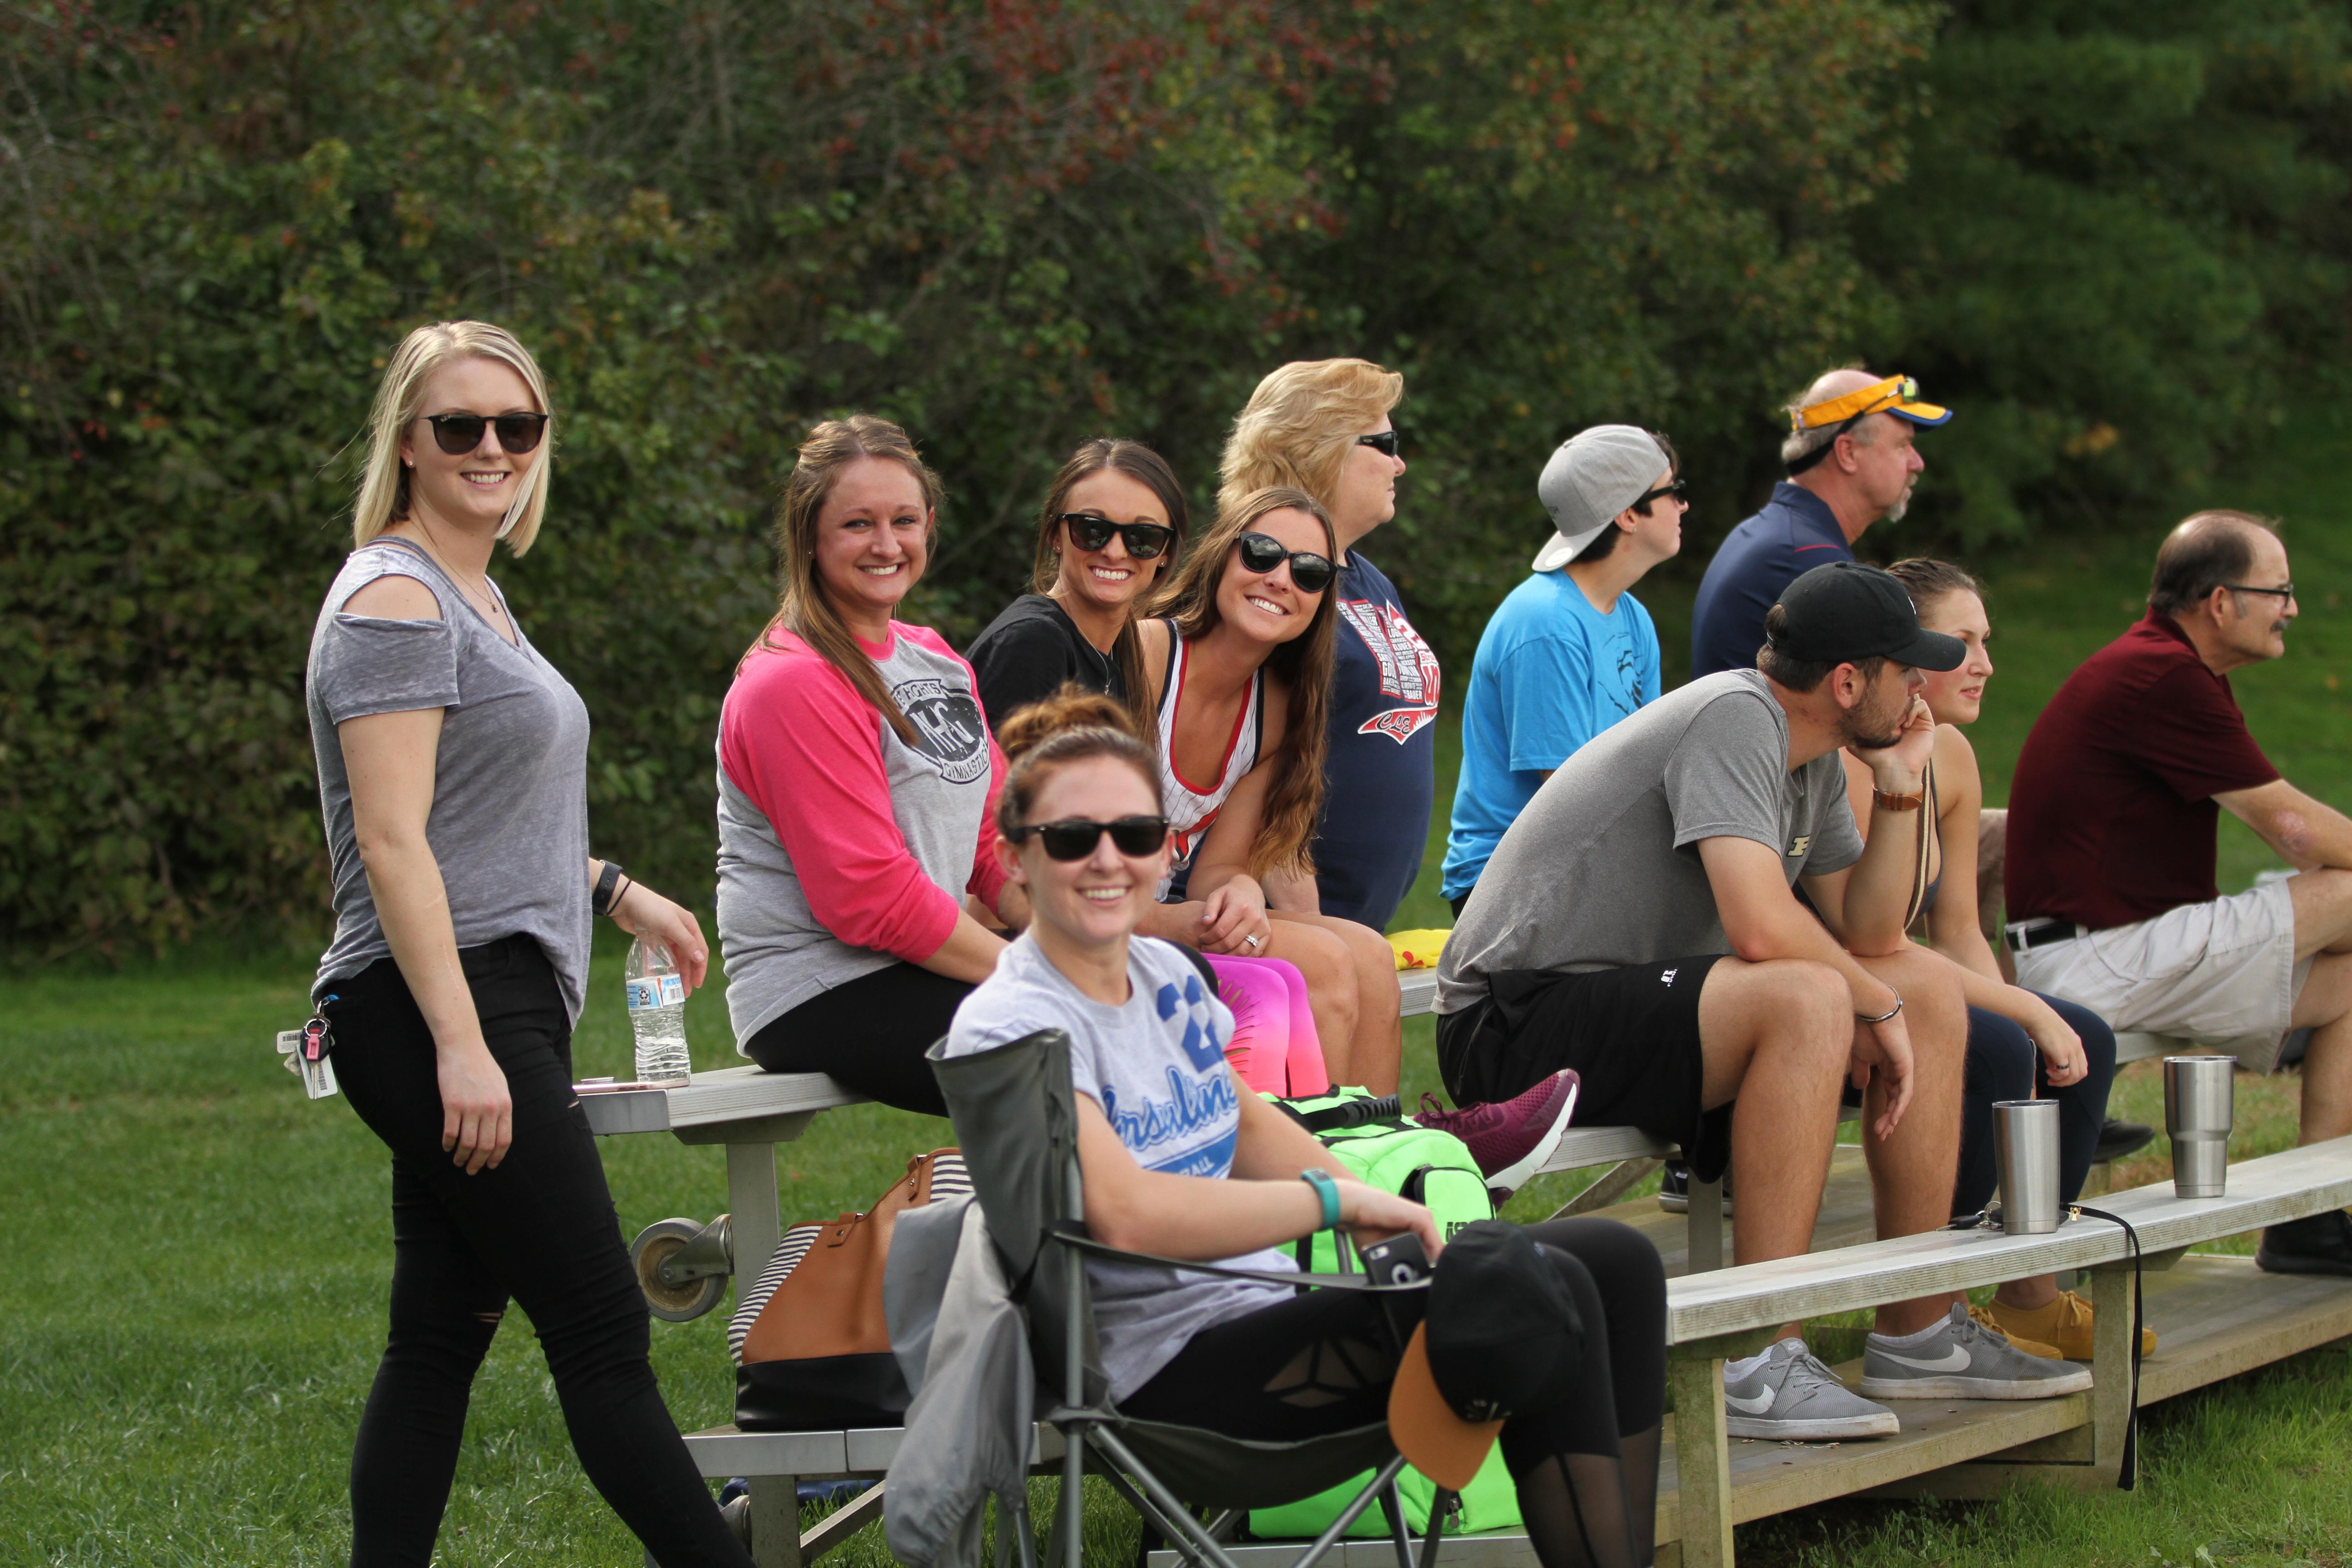 Reunion Weekend 2018 - Alumnae at Softball Game